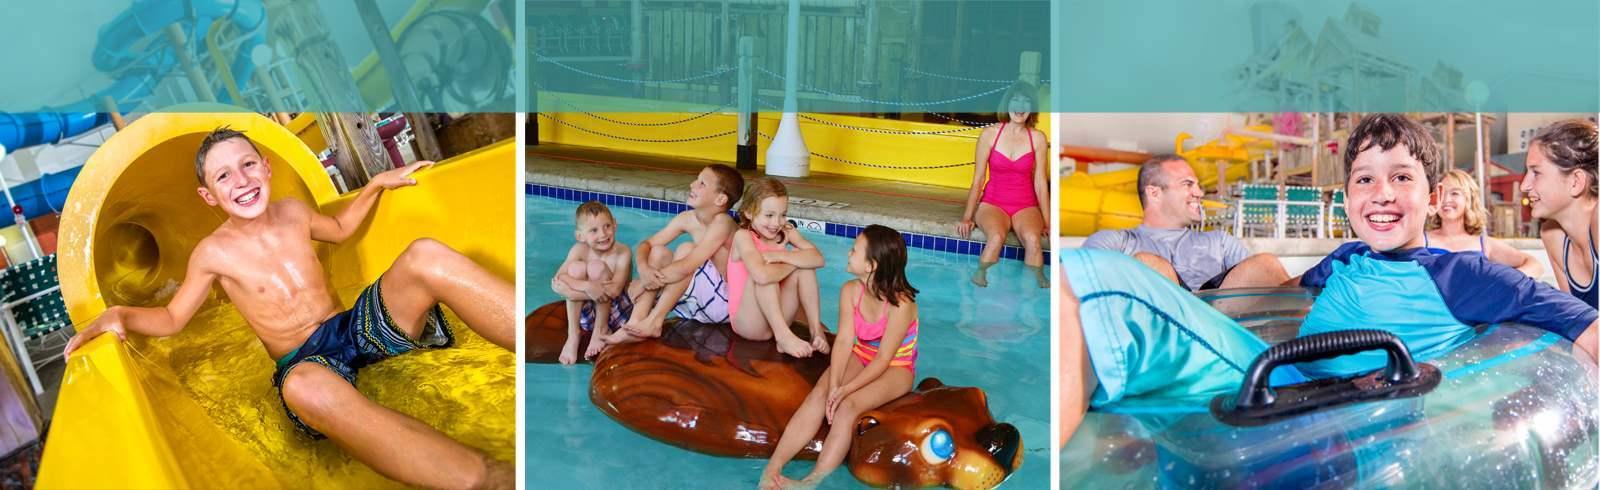 Jolly Mon Indoor Water Park - Margaritaville Lake Resort